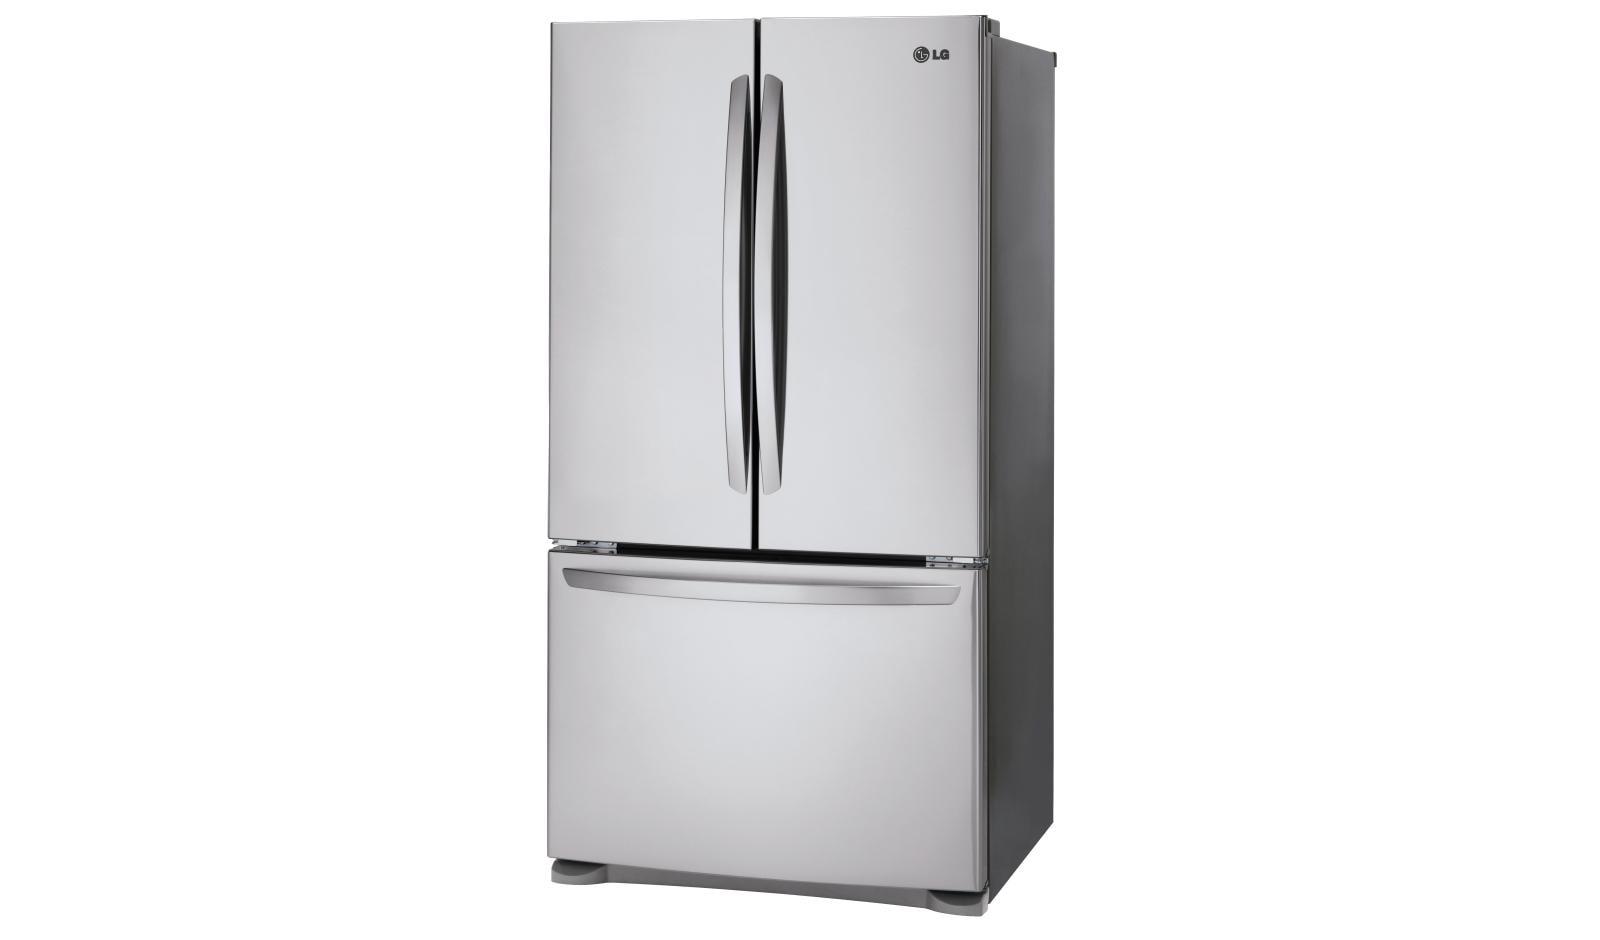 Lg lfcs25426s mega capacity 3 door french door refrigerator lg usa rubansaba